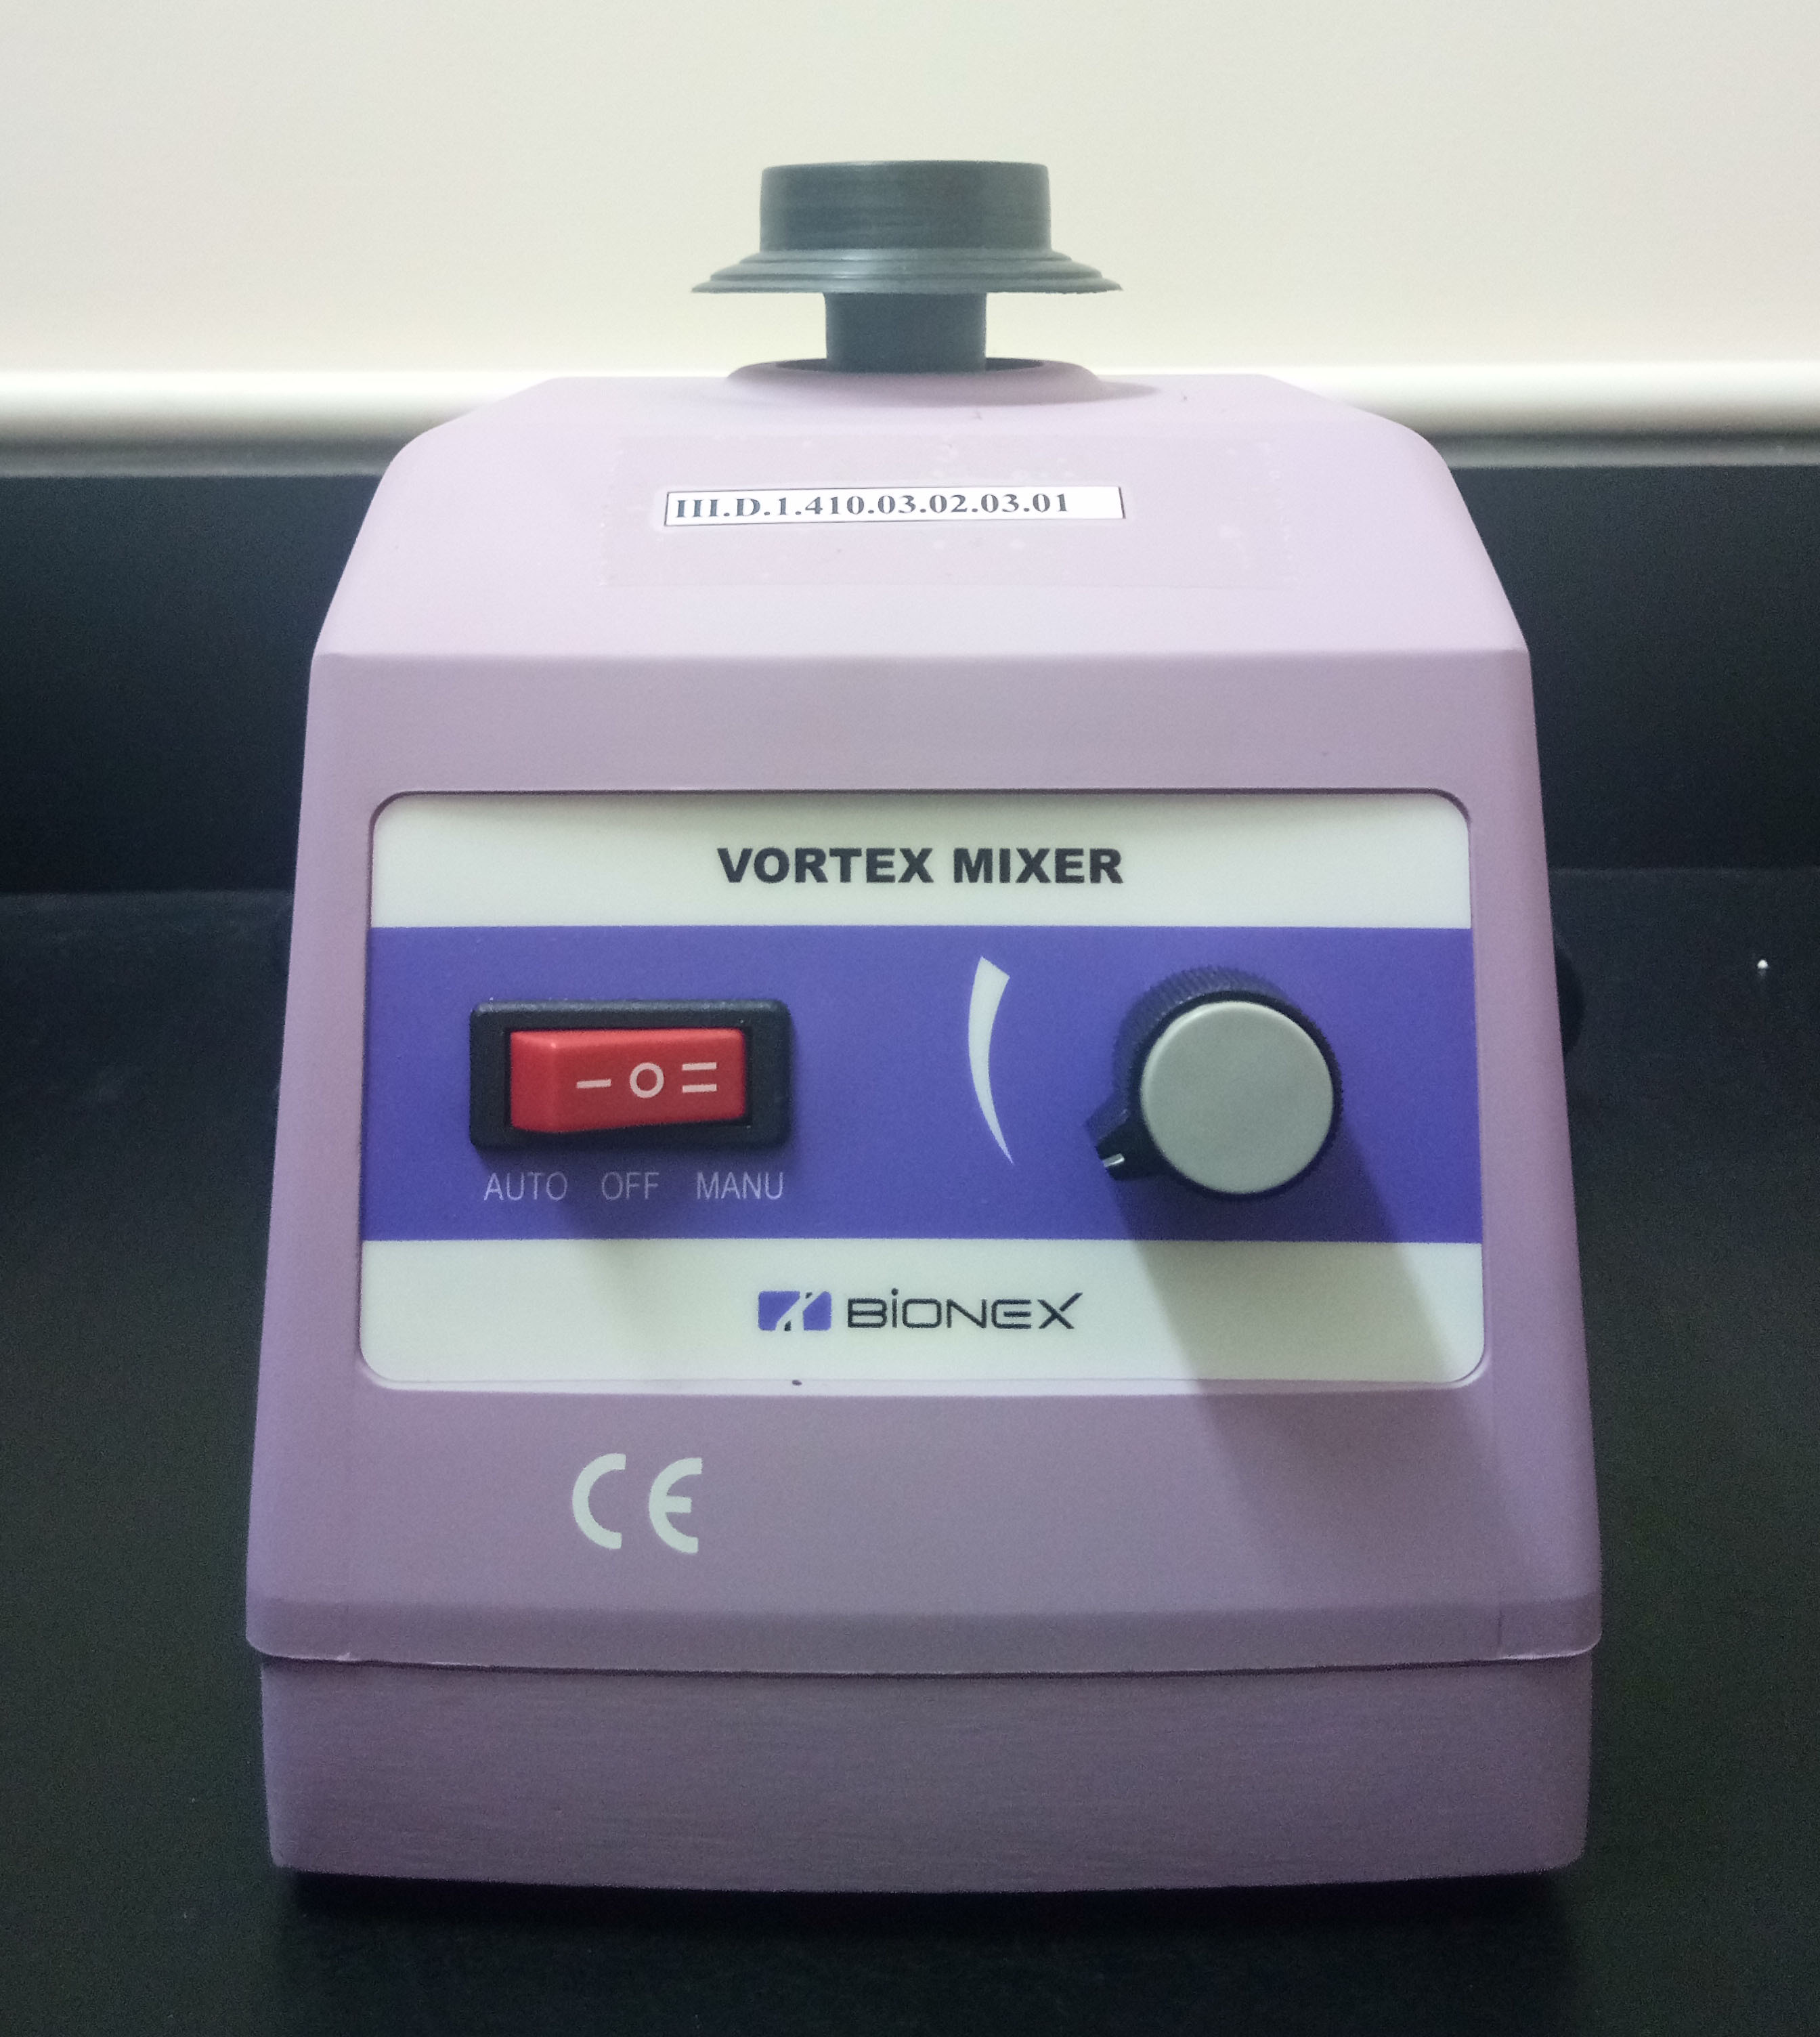 Vortex Mixer (Vision Bionex KMC-1300V)